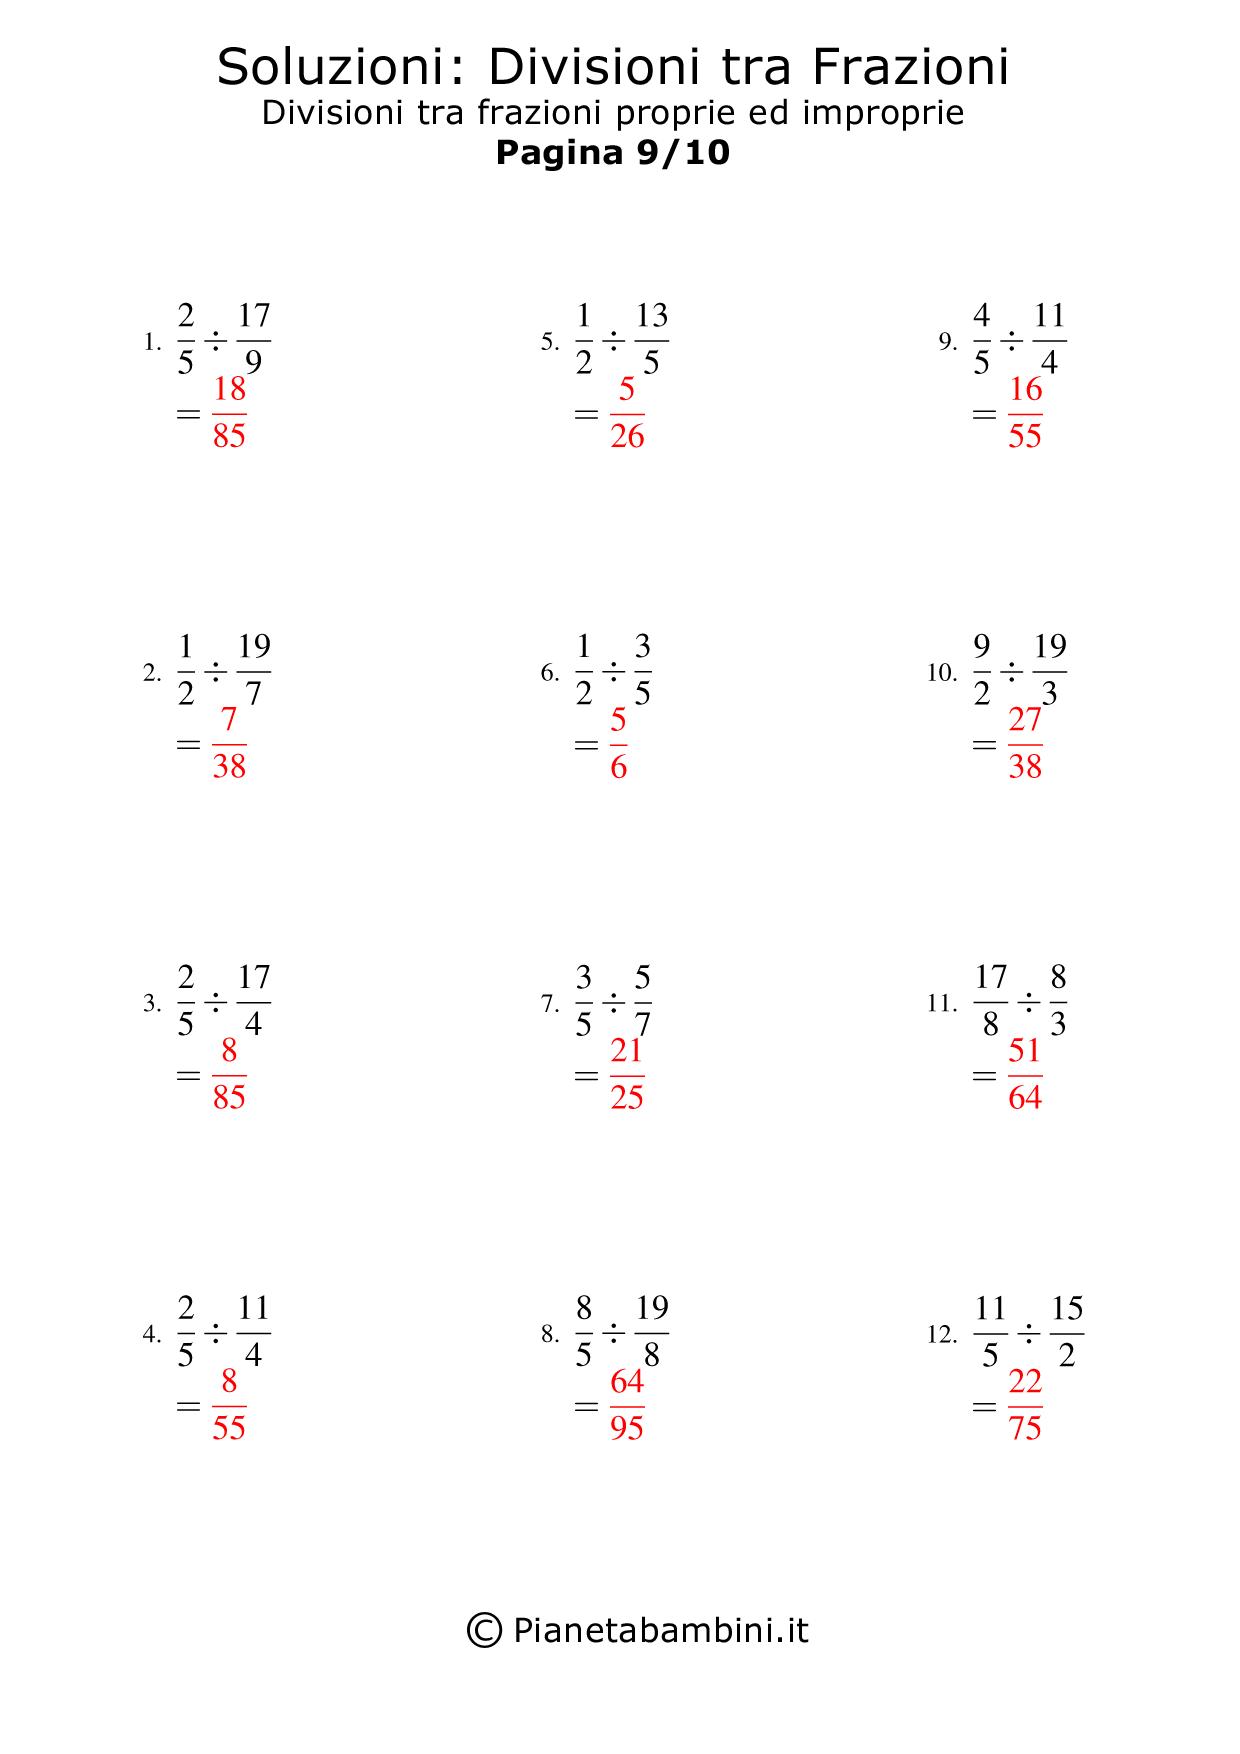 Soluzioni-Divisioni-Frazioni-Proprie-Improprie_09